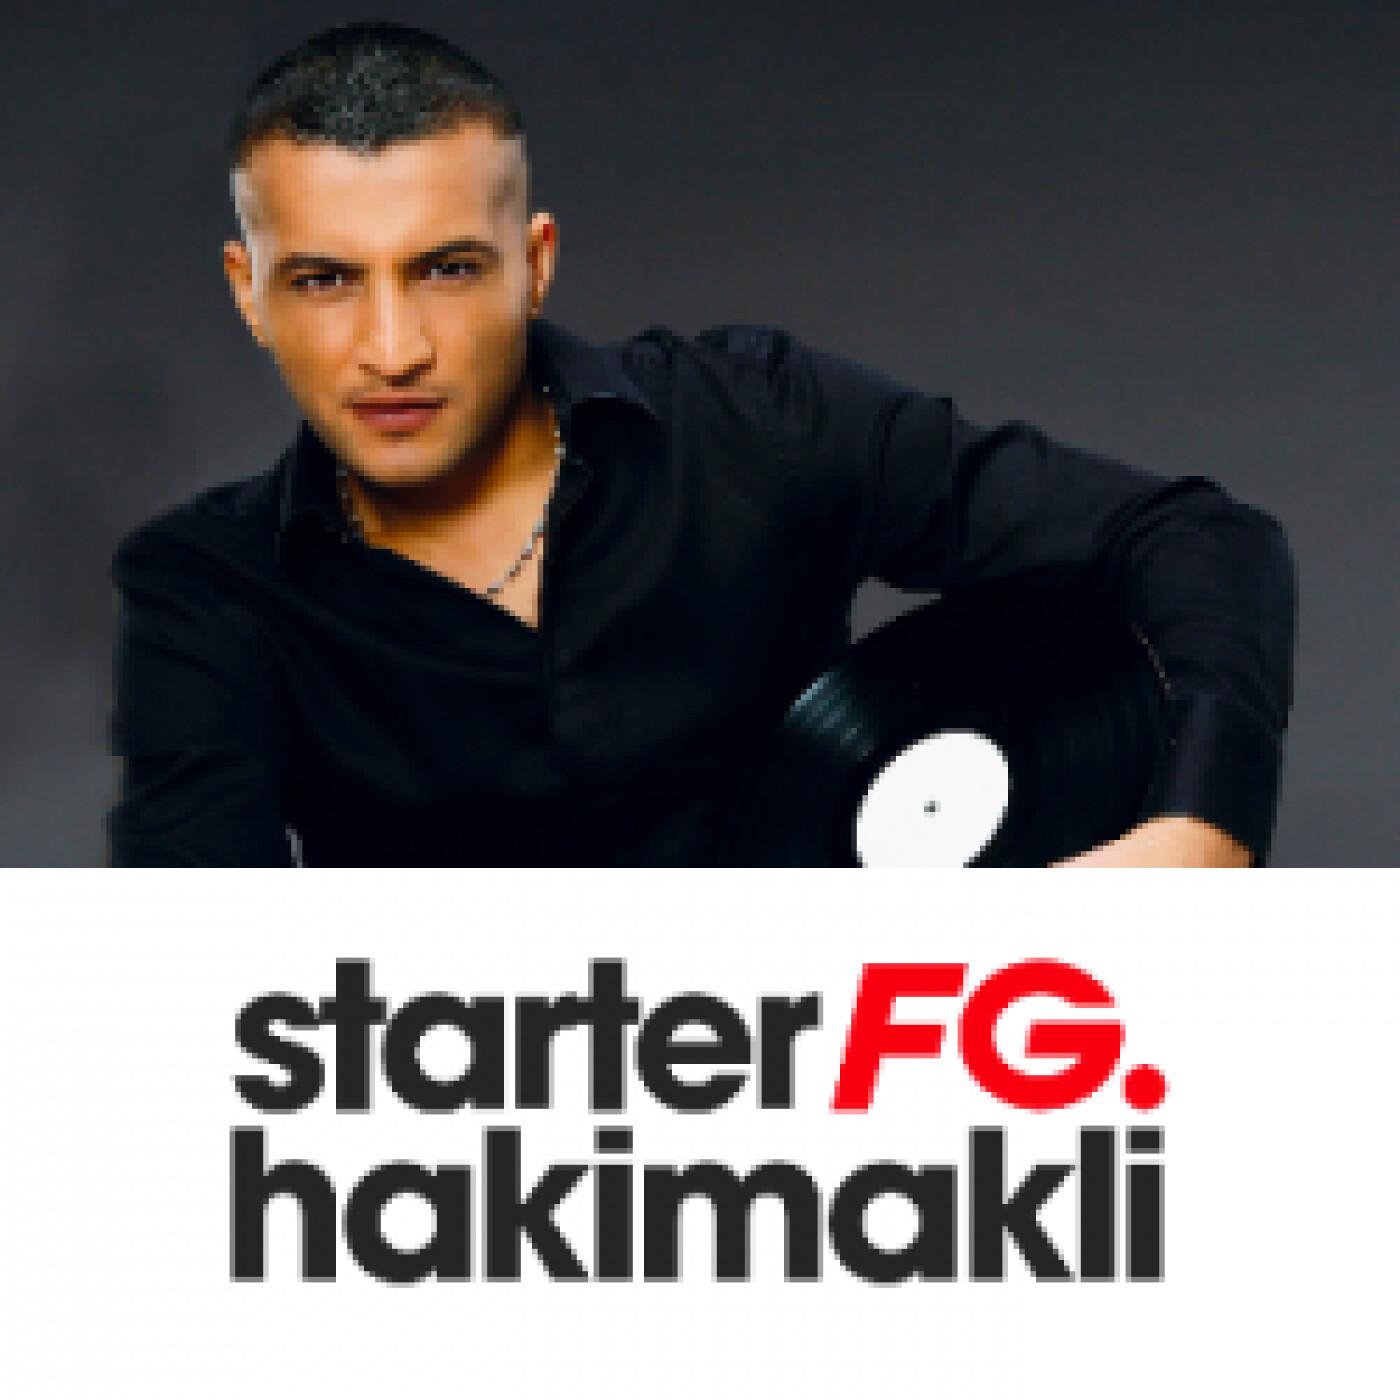 STARTER FG BY HAKIMAKLI LUNDI 1er MARS 2021